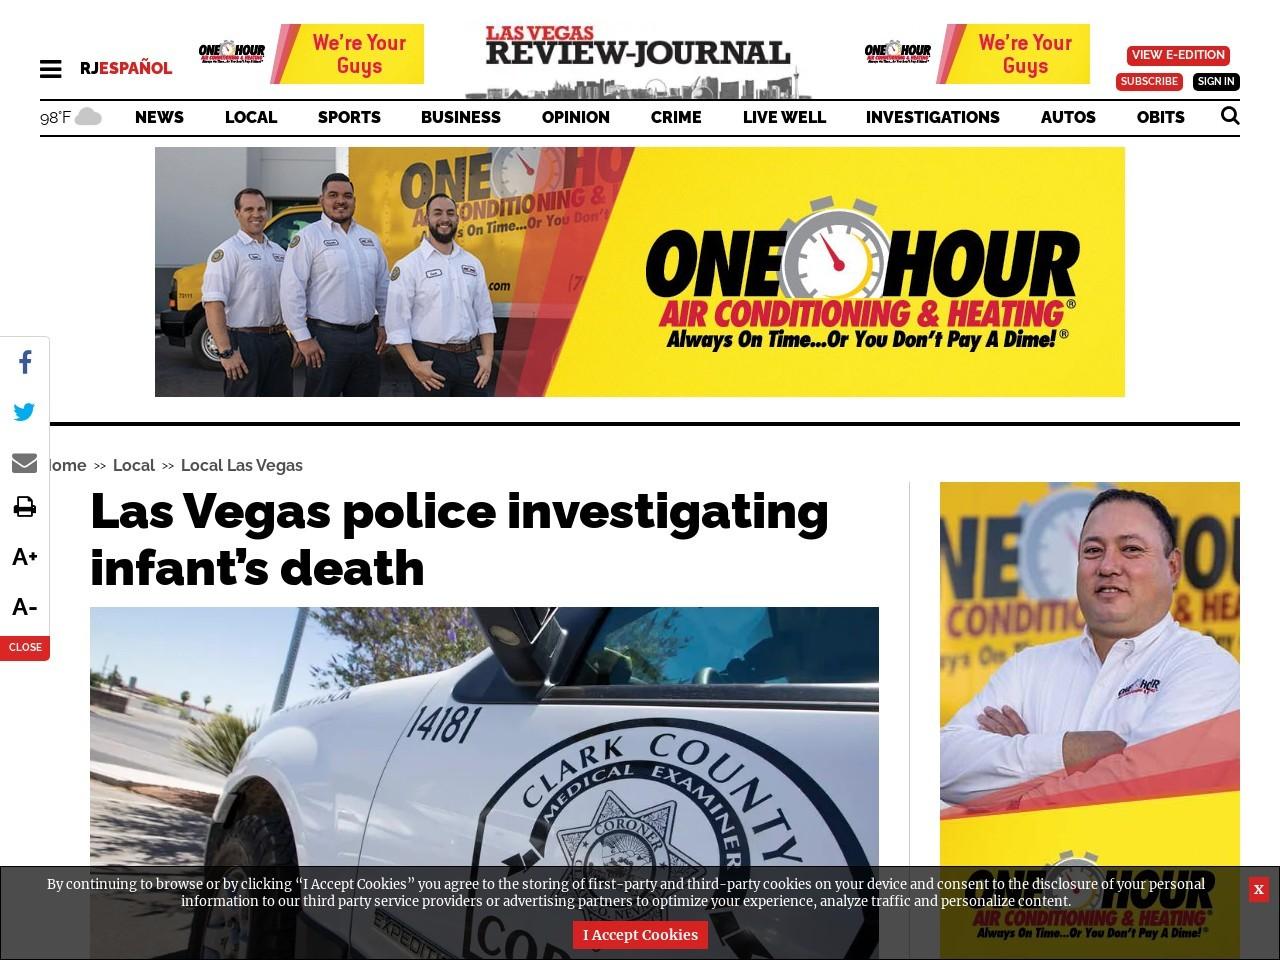 Las Vegas police investigating infant's death